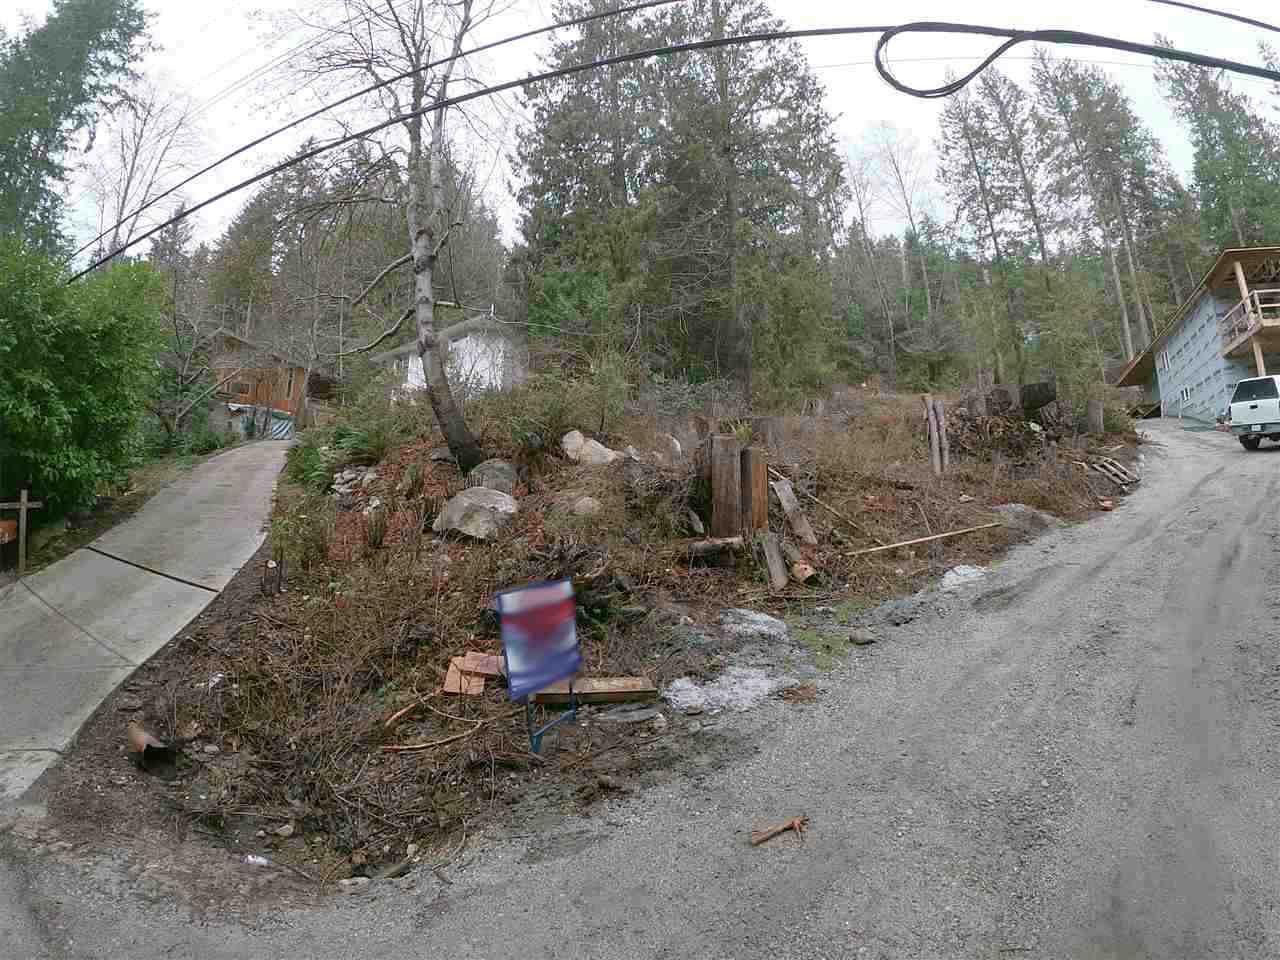 Main Photo: Lot 11 SECHELT INLET Road in Sechelt: Sechelt District Land for sale (Sunshine Coast)  : MLS®# R2333235